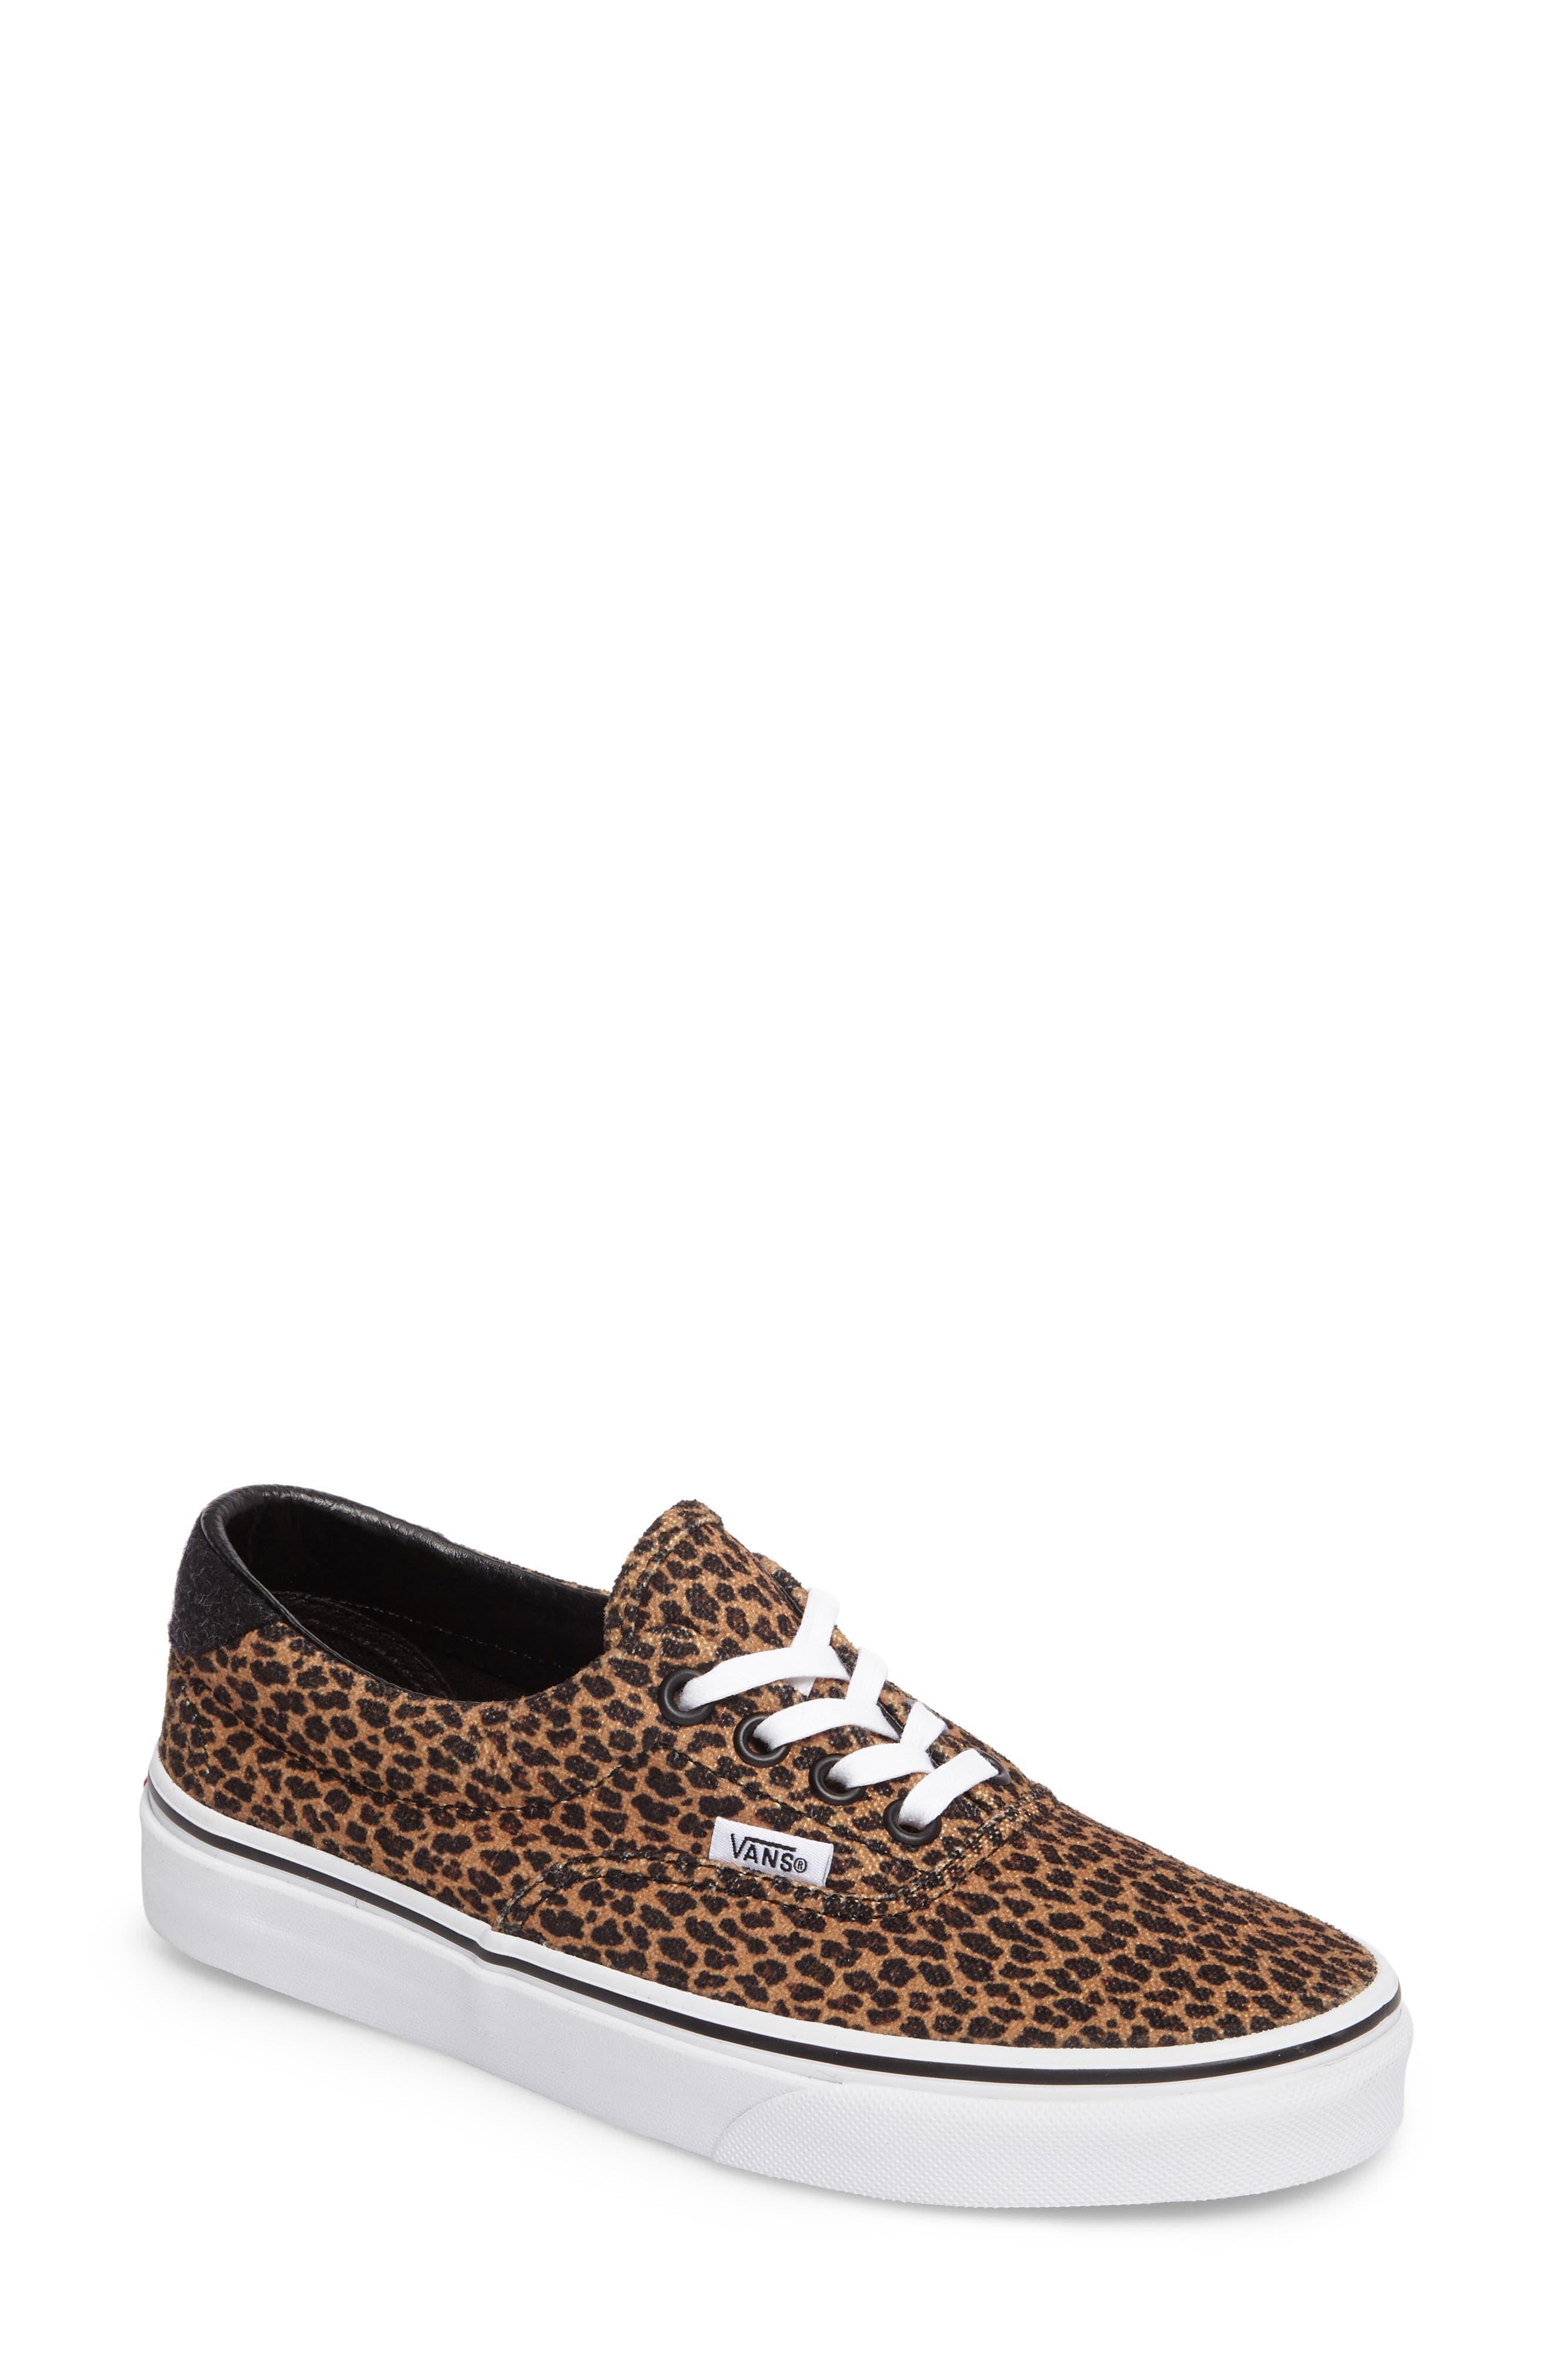 Alternate Image 1 Selected - Vans Era 59 Sneaker (Women)